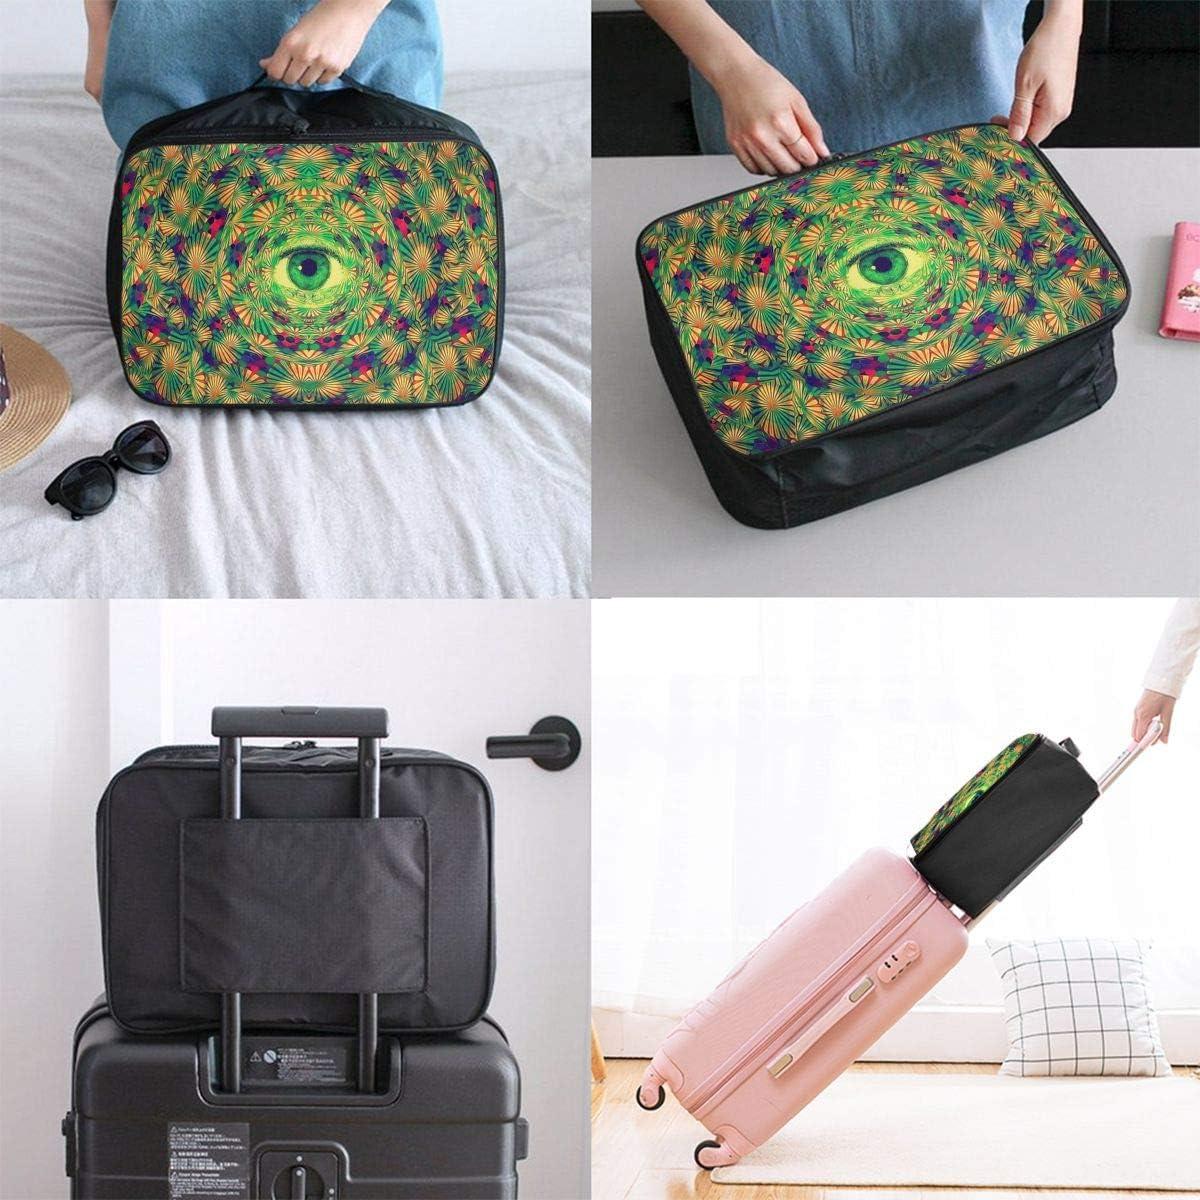 Devils Eye Travel Carry-on Luggage Weekender Bag Overnight Tote Flight Duffel In Trolley Handle